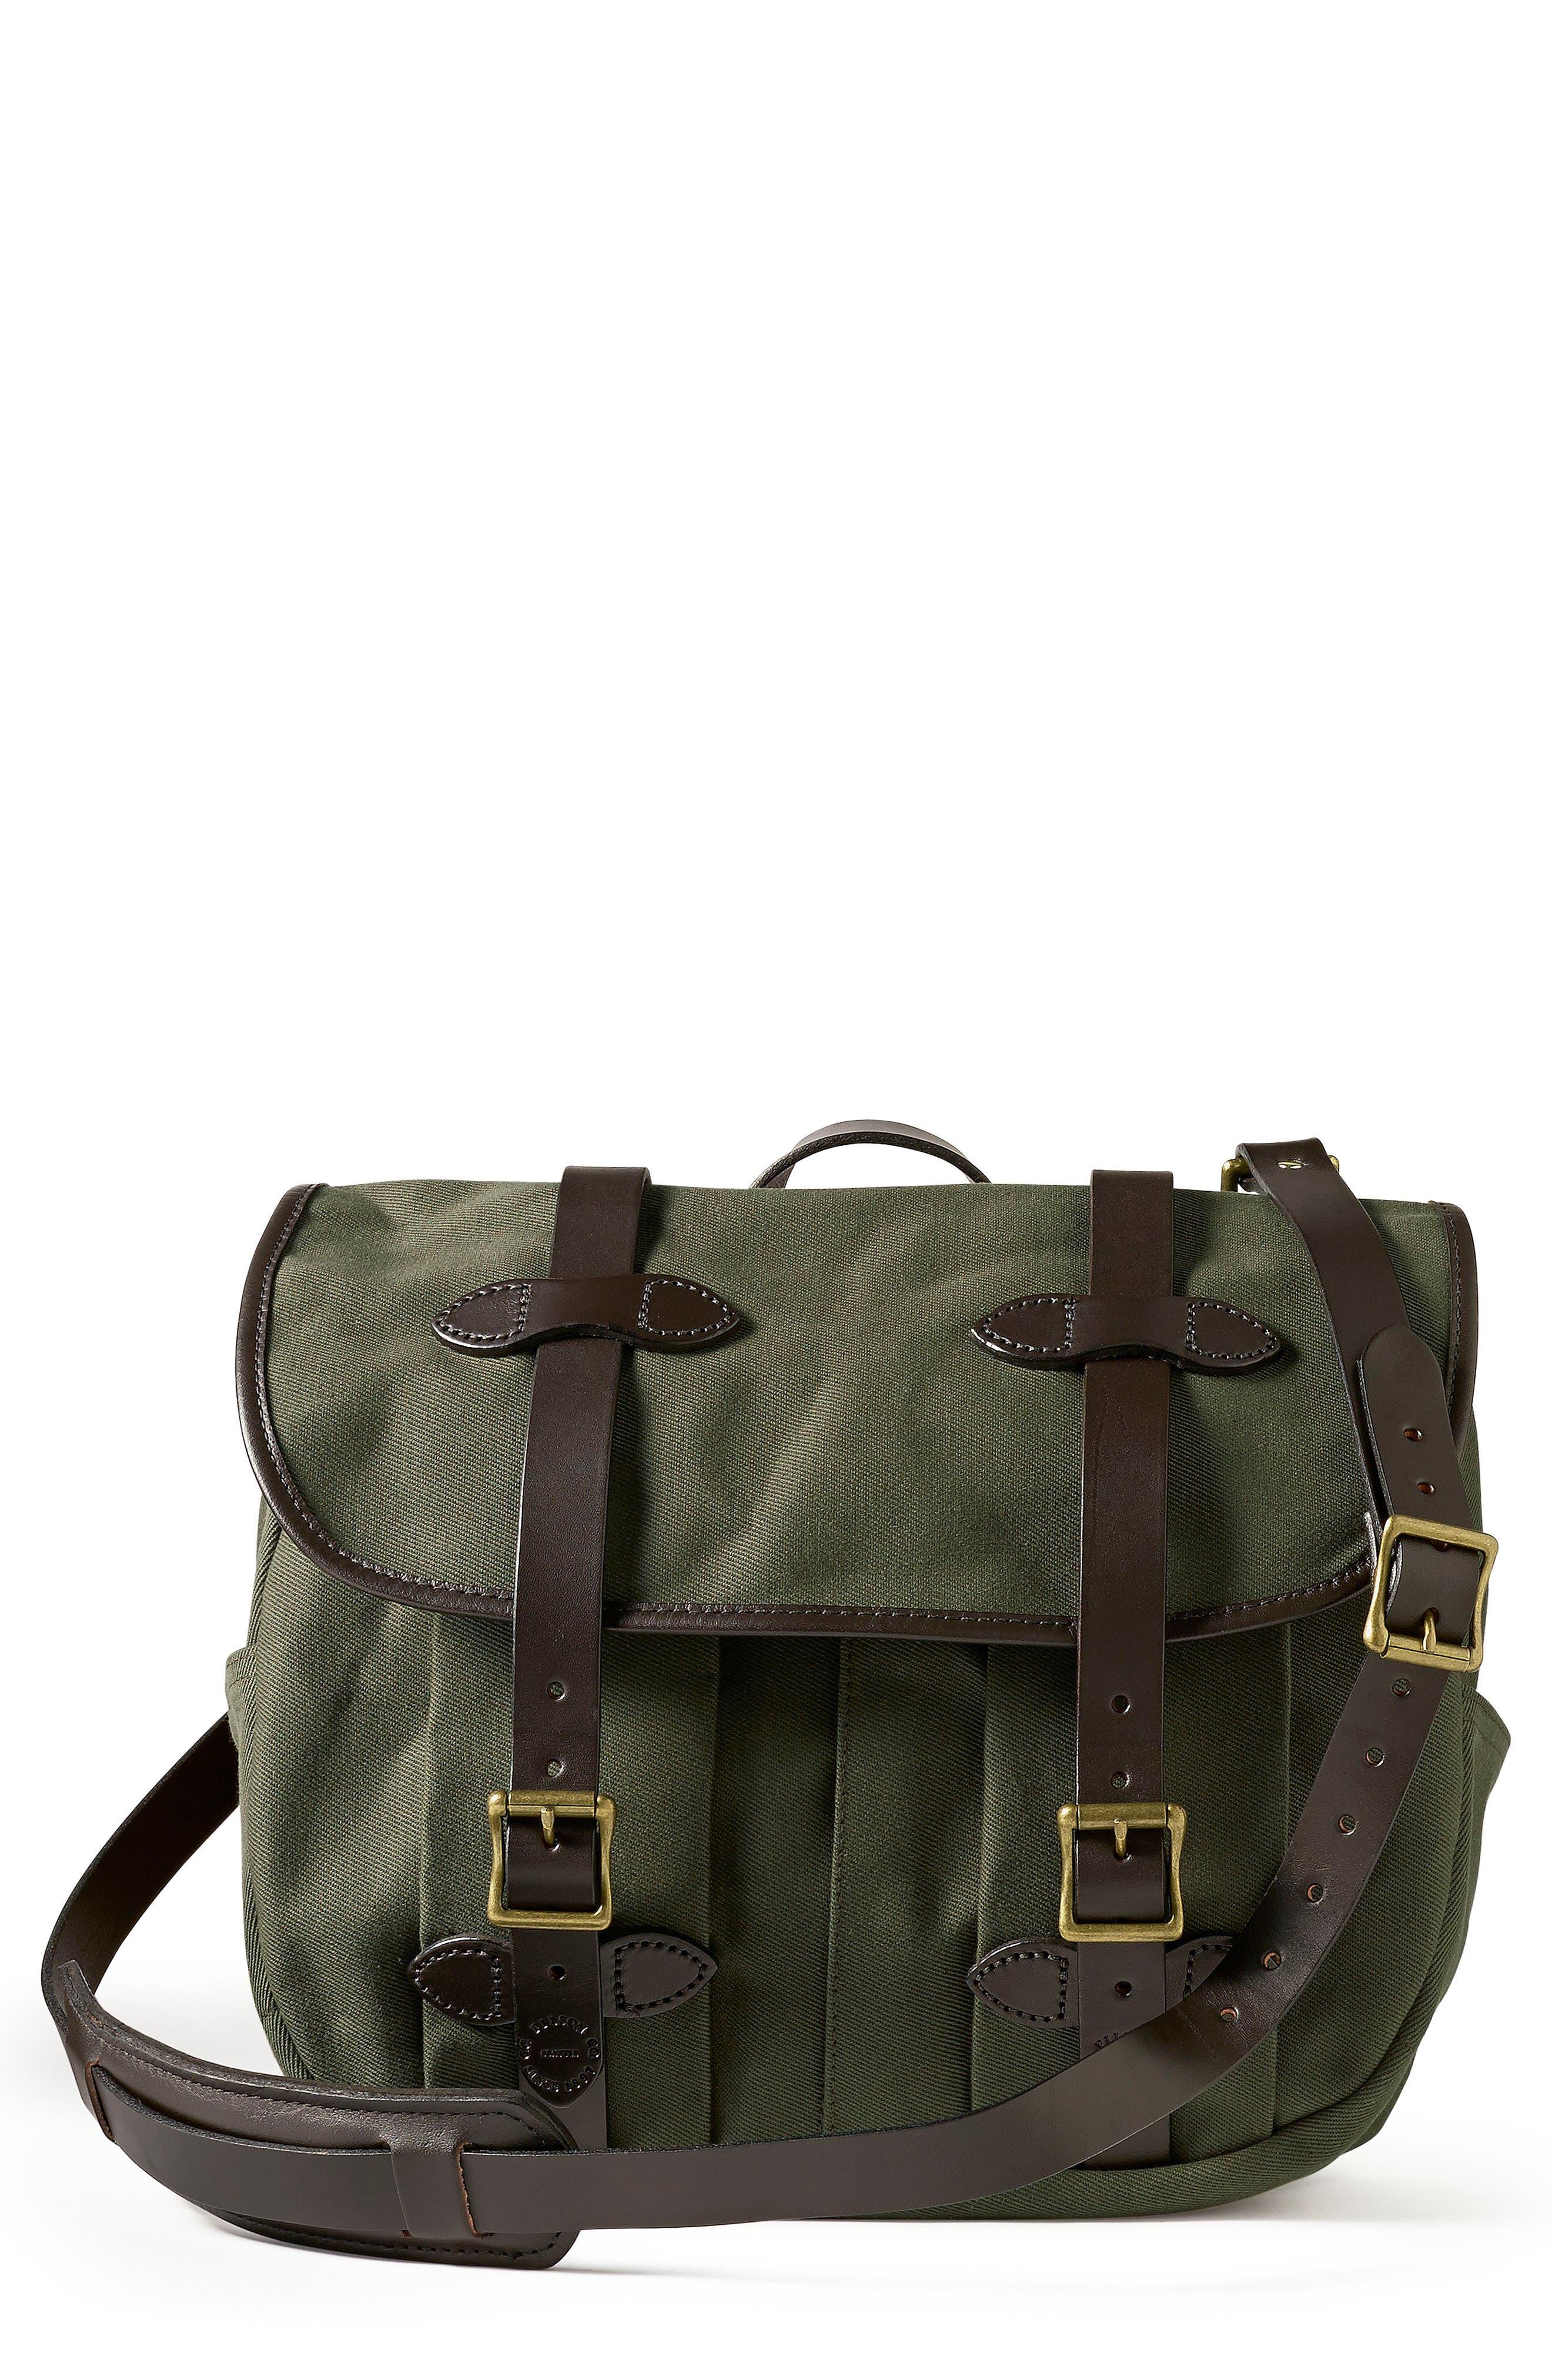 Medium Field Bag,                             Main thumbnail 1, color,                             Otter Green